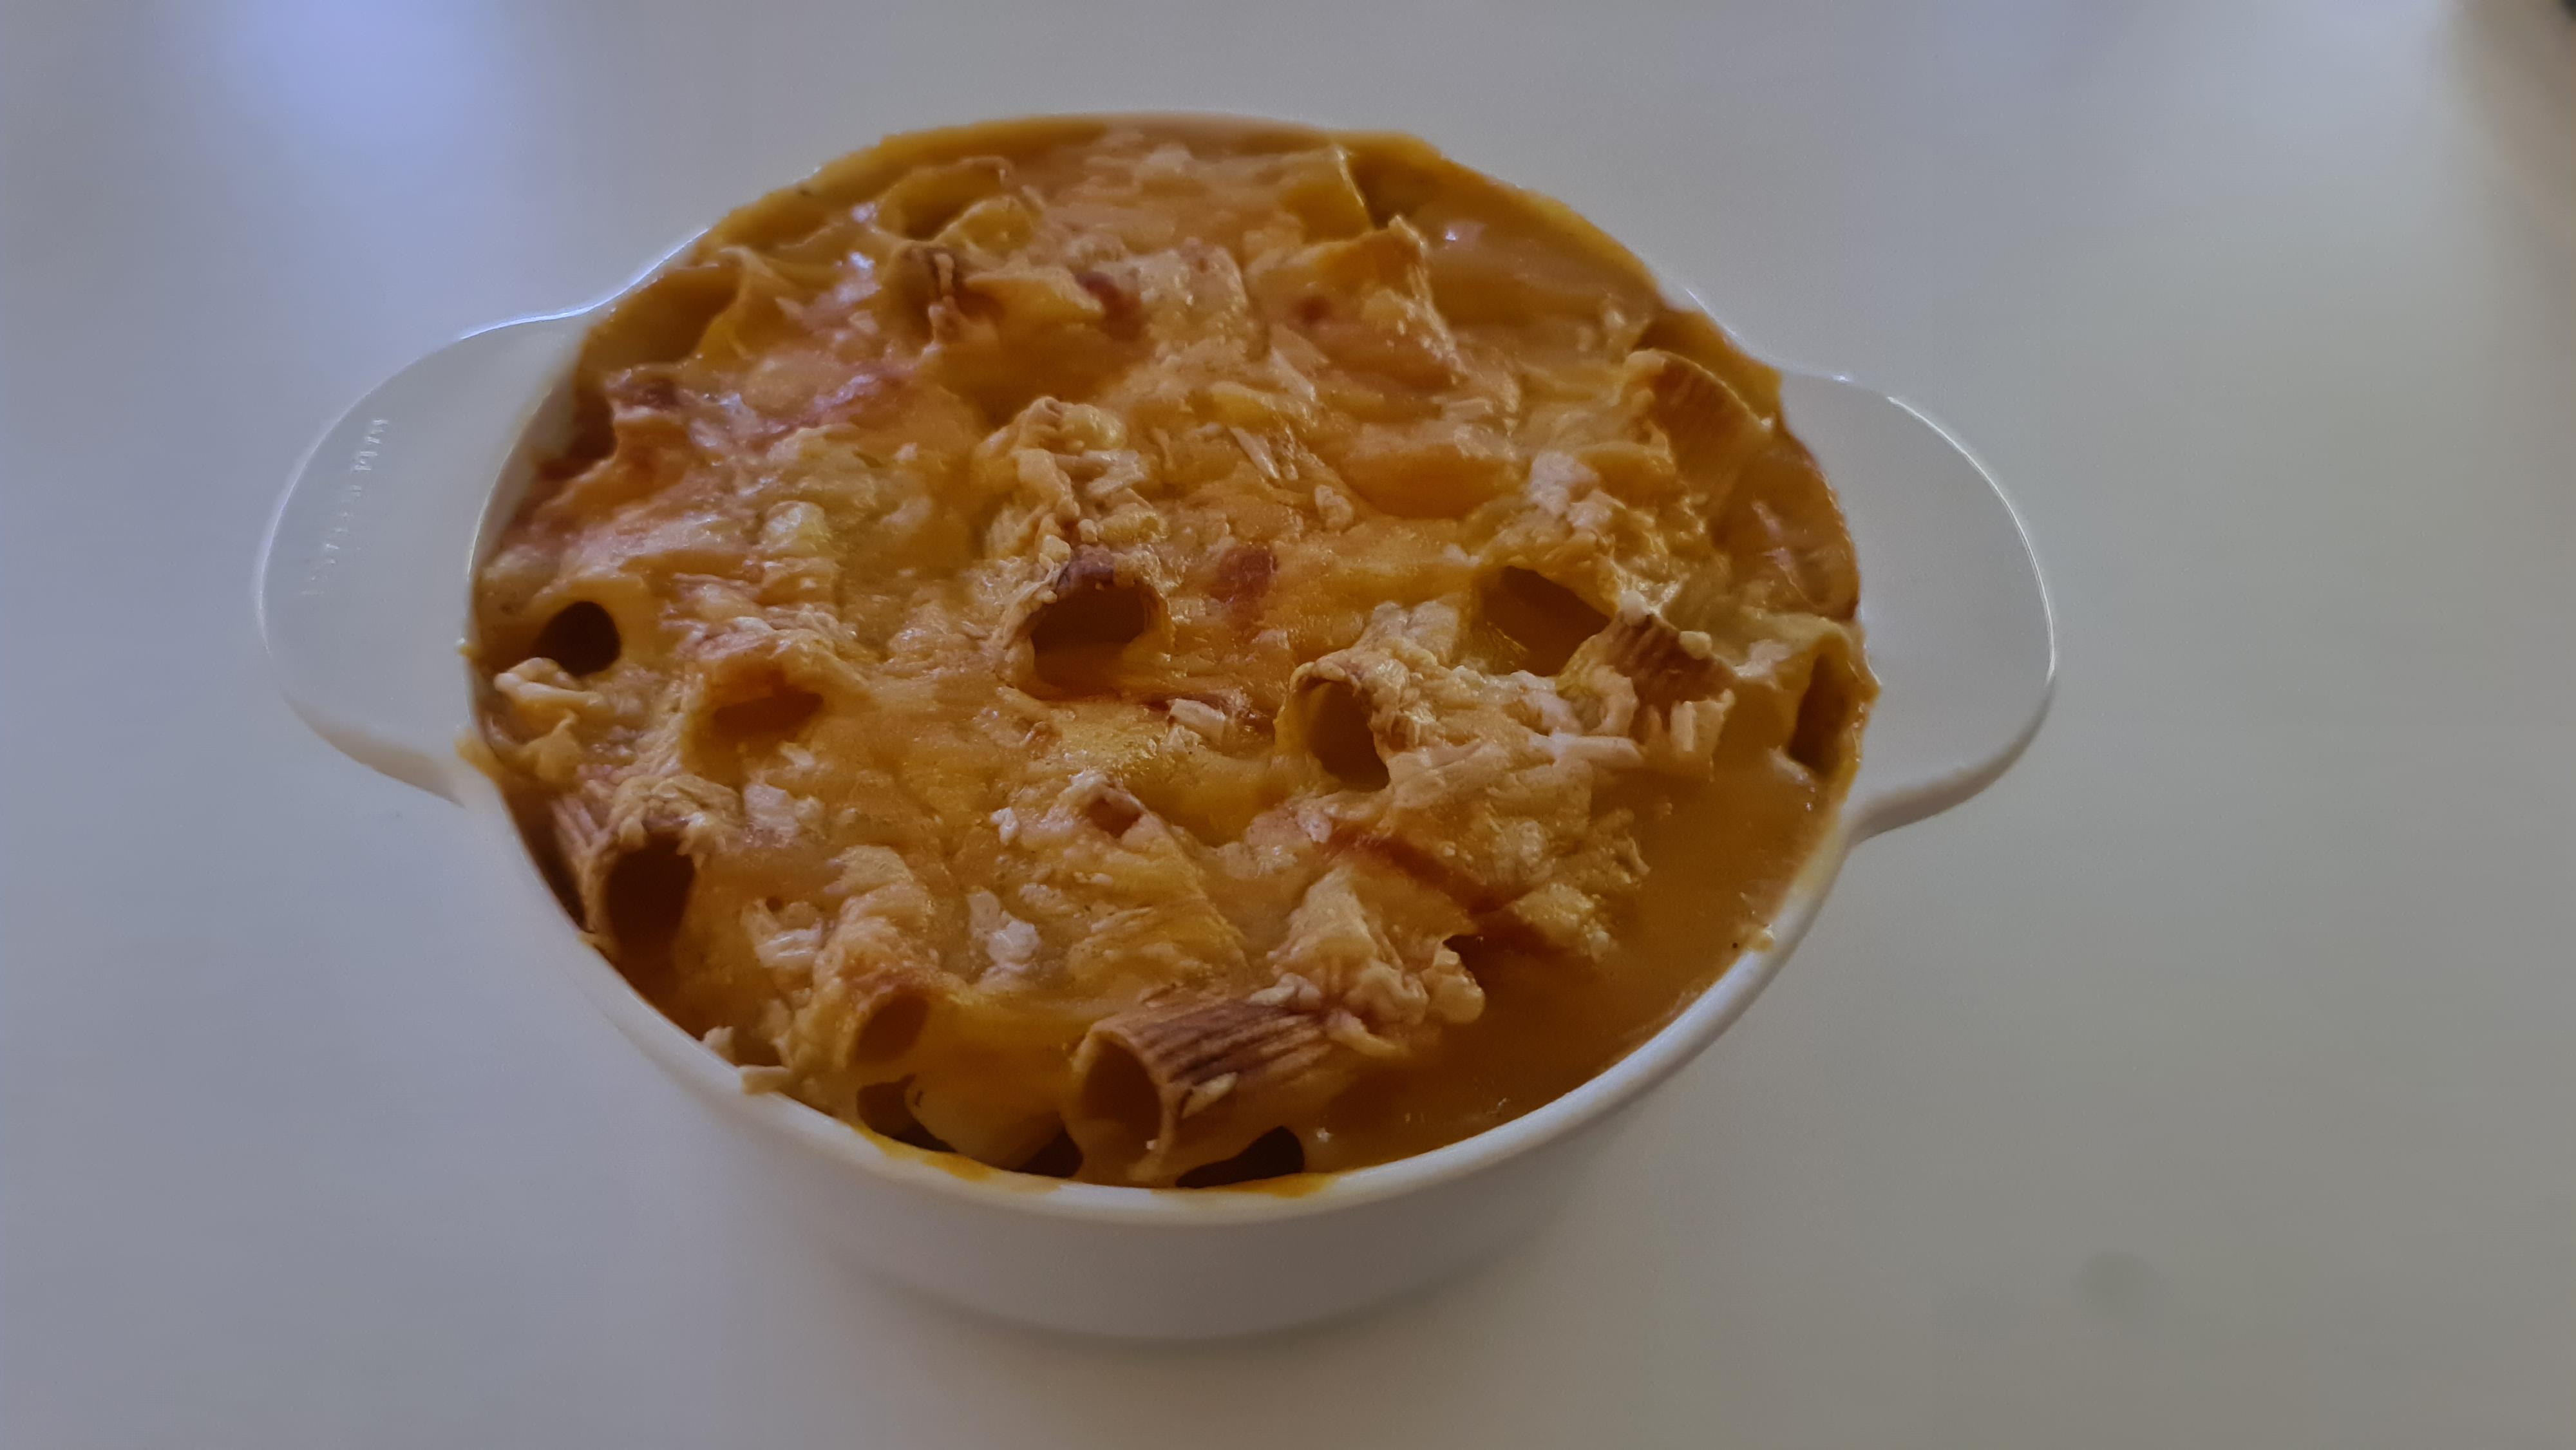 https://foodloader.net/Holz_2020-09-04_Rigatoni-Auflauf_1.jpg